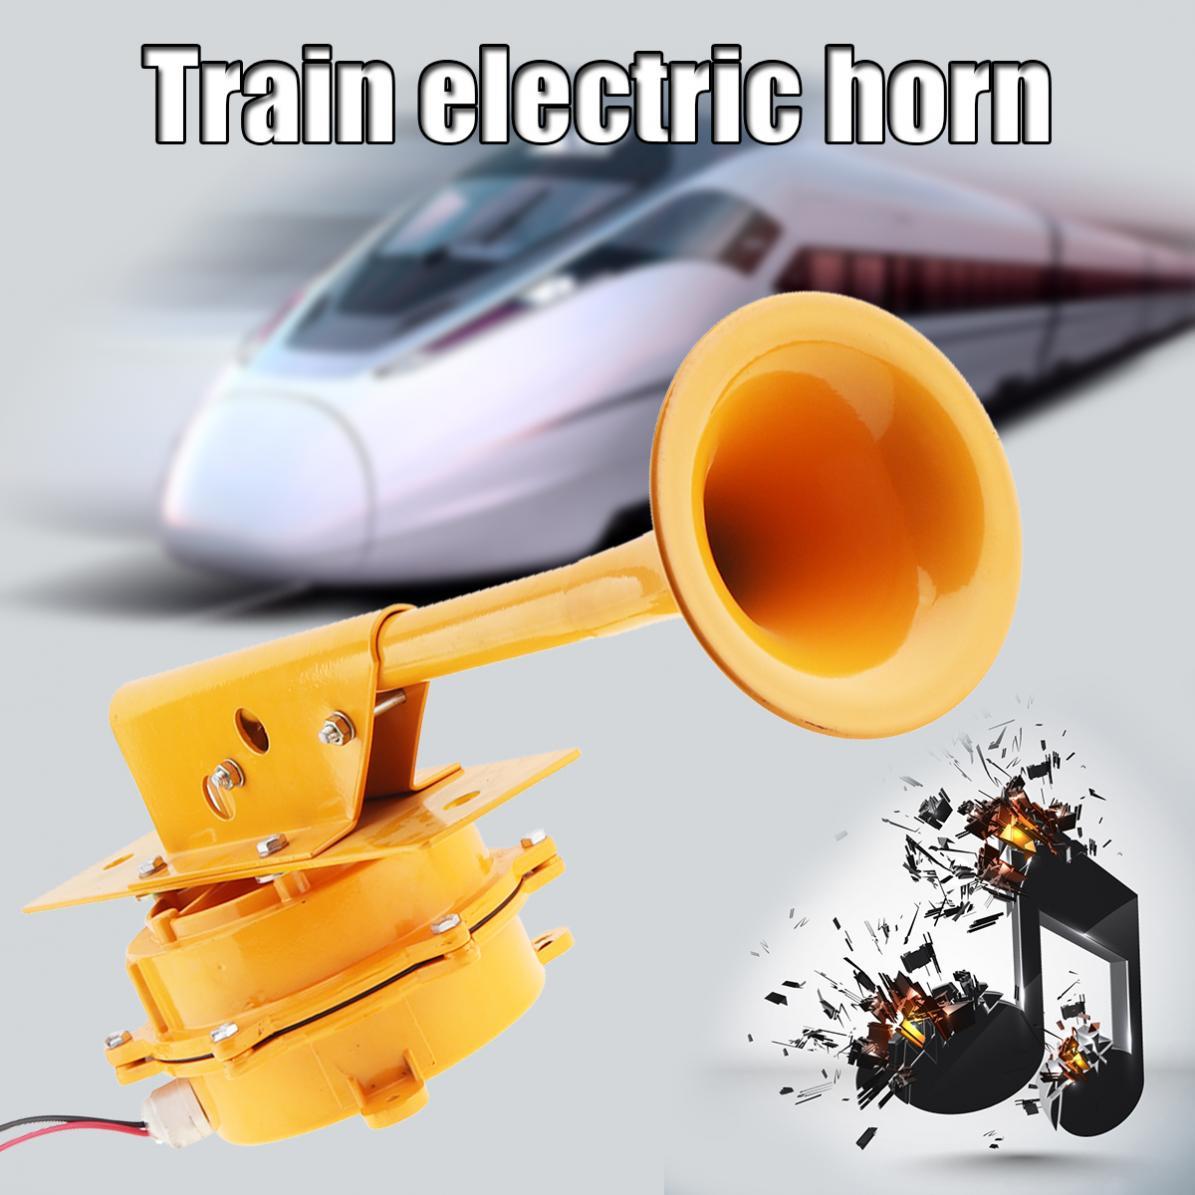 12V /24V 1280DB Super Loud All Metal Train Horn No Need Compressor for Truck / Boat / Train / Lorry